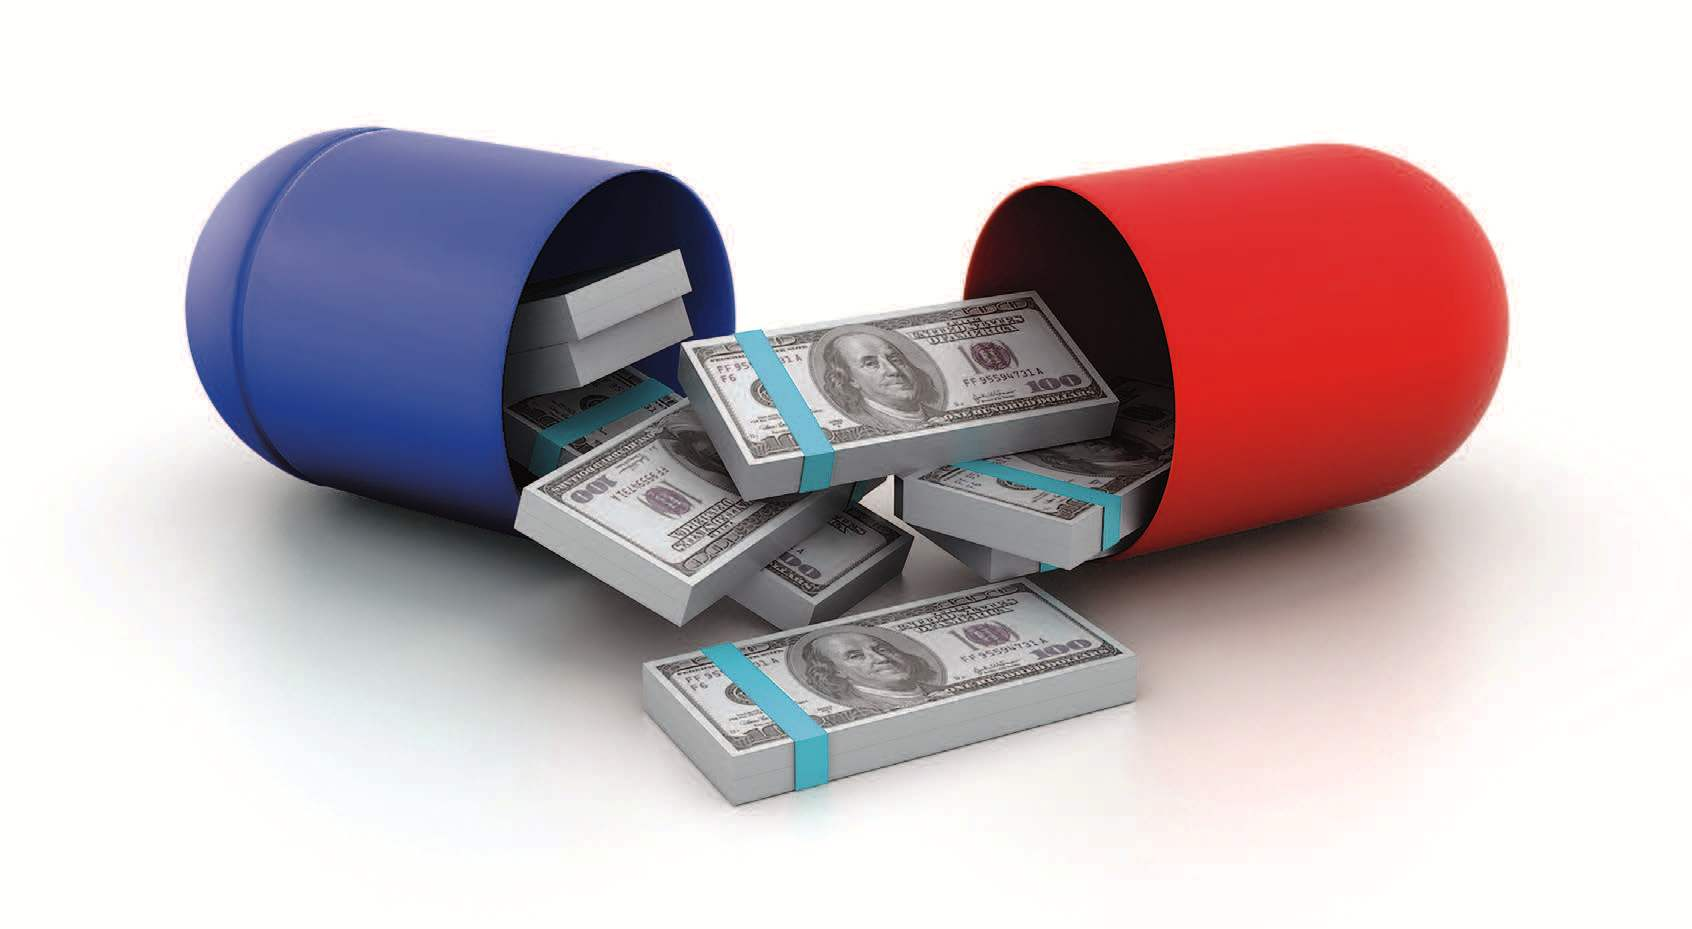 Таблетка по цене иномарки — 7 баснословно дорогих лекарств 2020 года